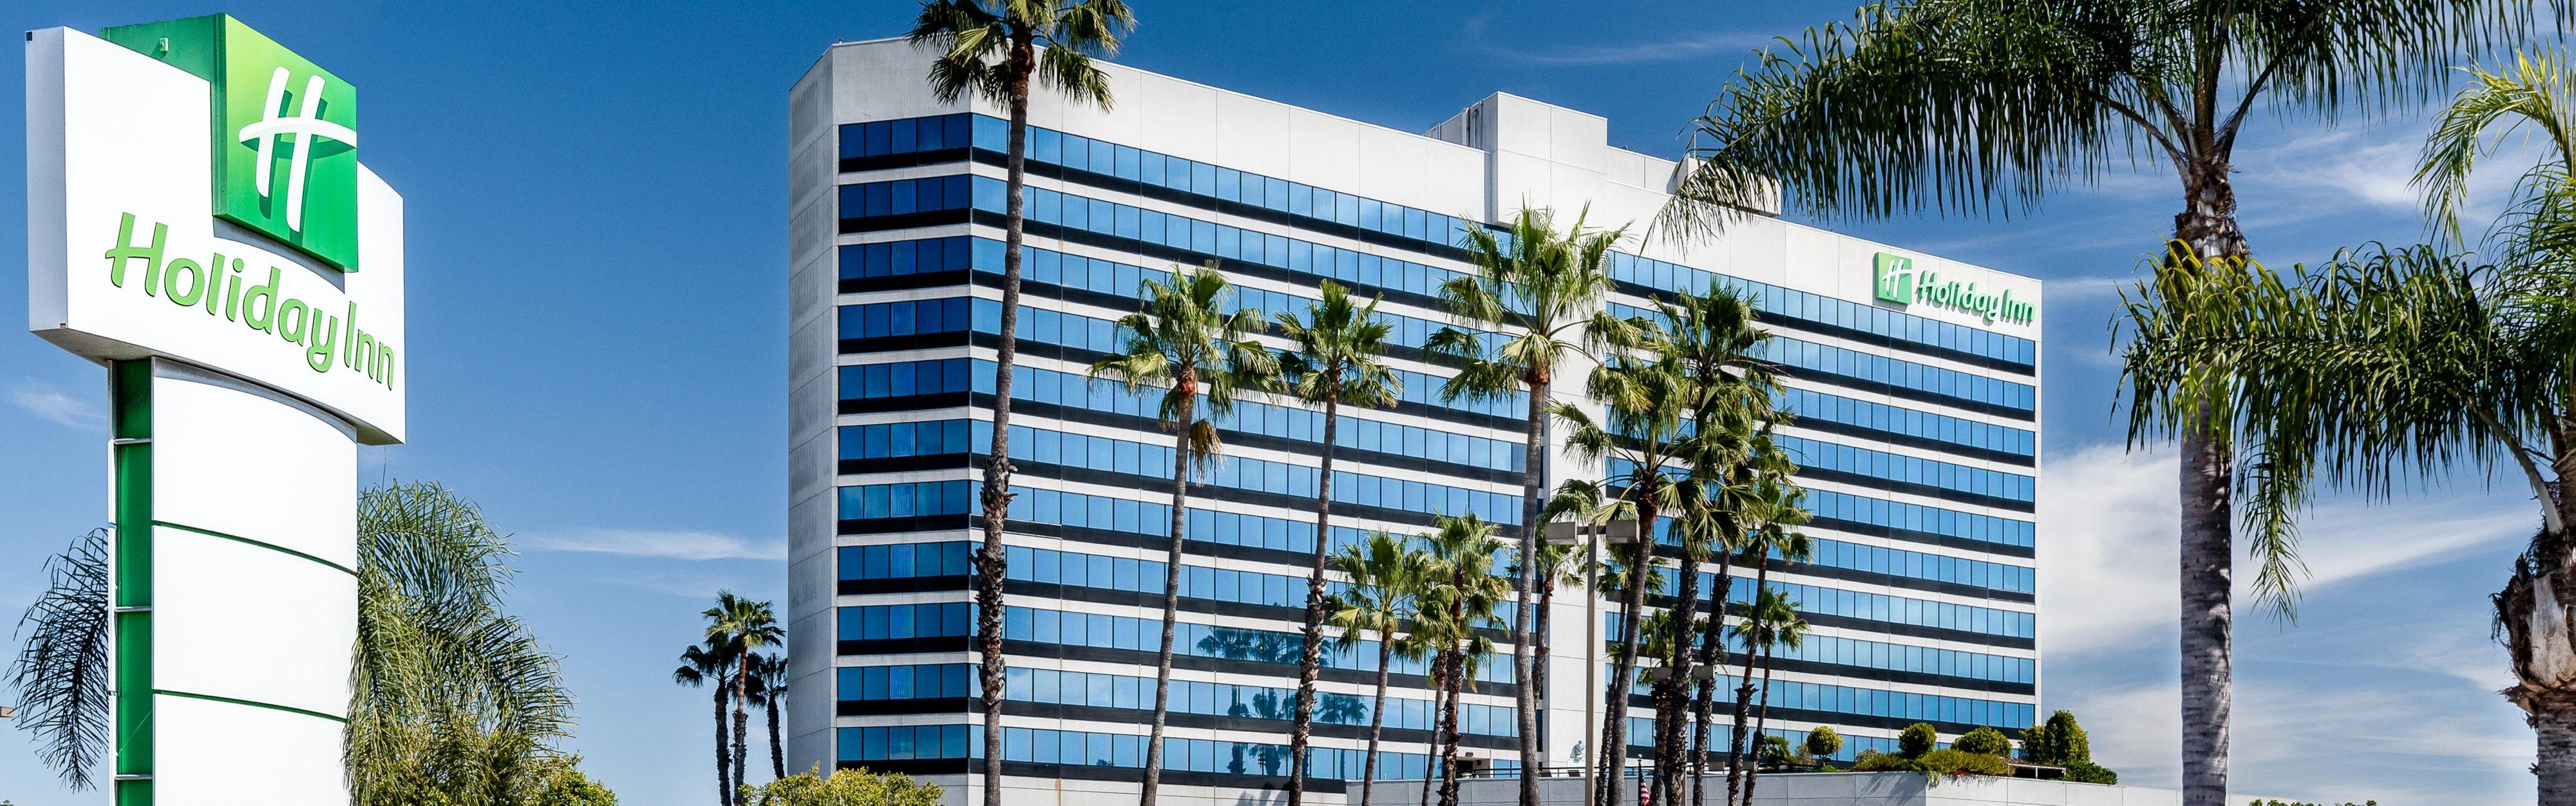 Holiday Inn Los Angeles Gateway - Torrance image 0